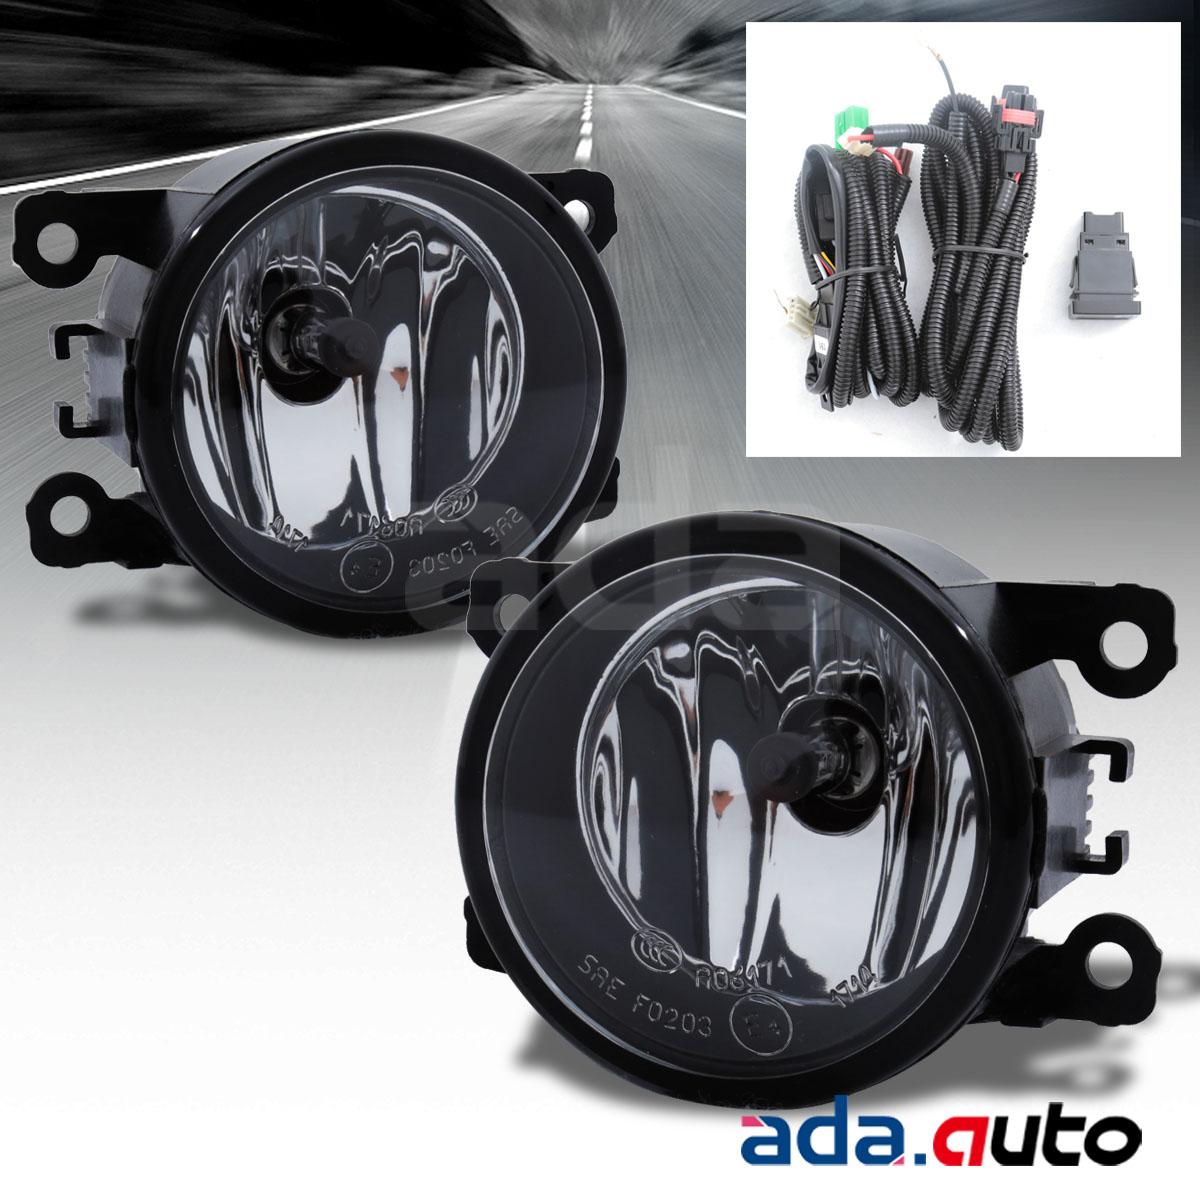 hight resolution of 2006 2014 suzuki grand vitara glass lens fog lights wiring harness